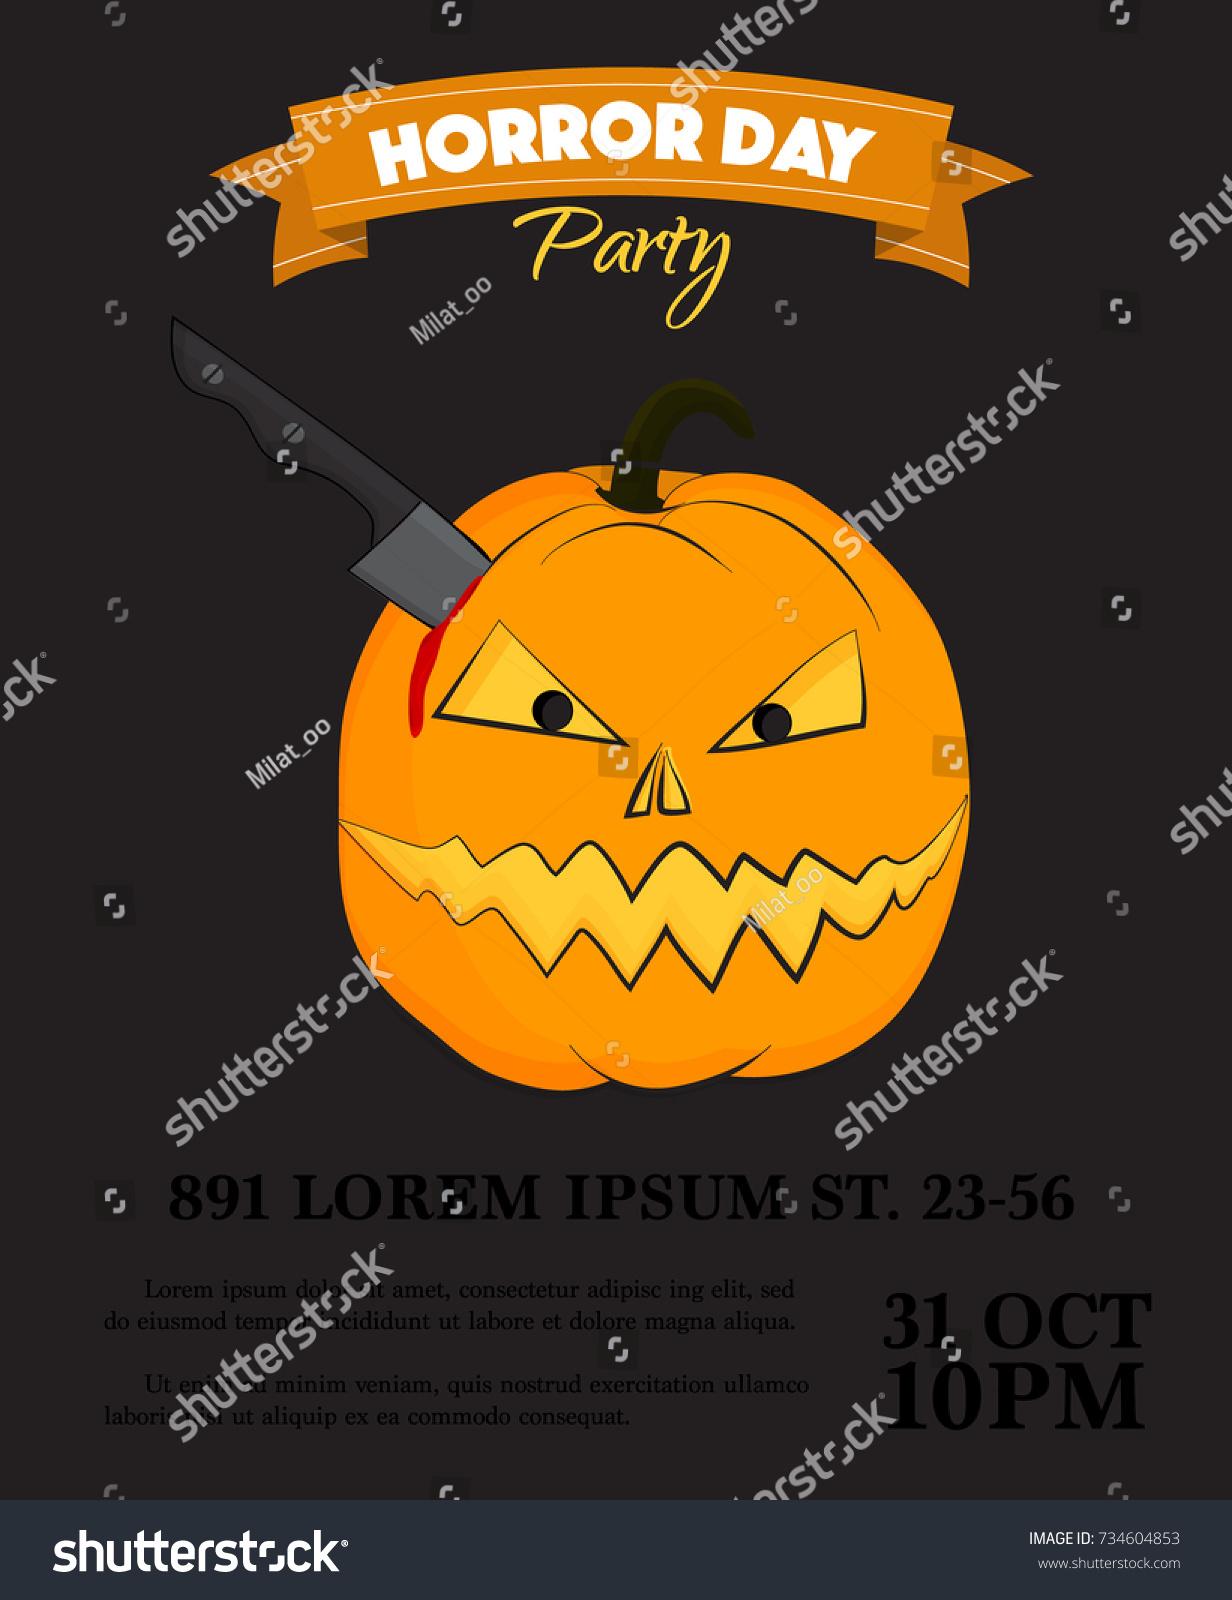 Vector Halloween Party Invitation Scary Pumpkin Vector – Scary or Horror Invitation Cards